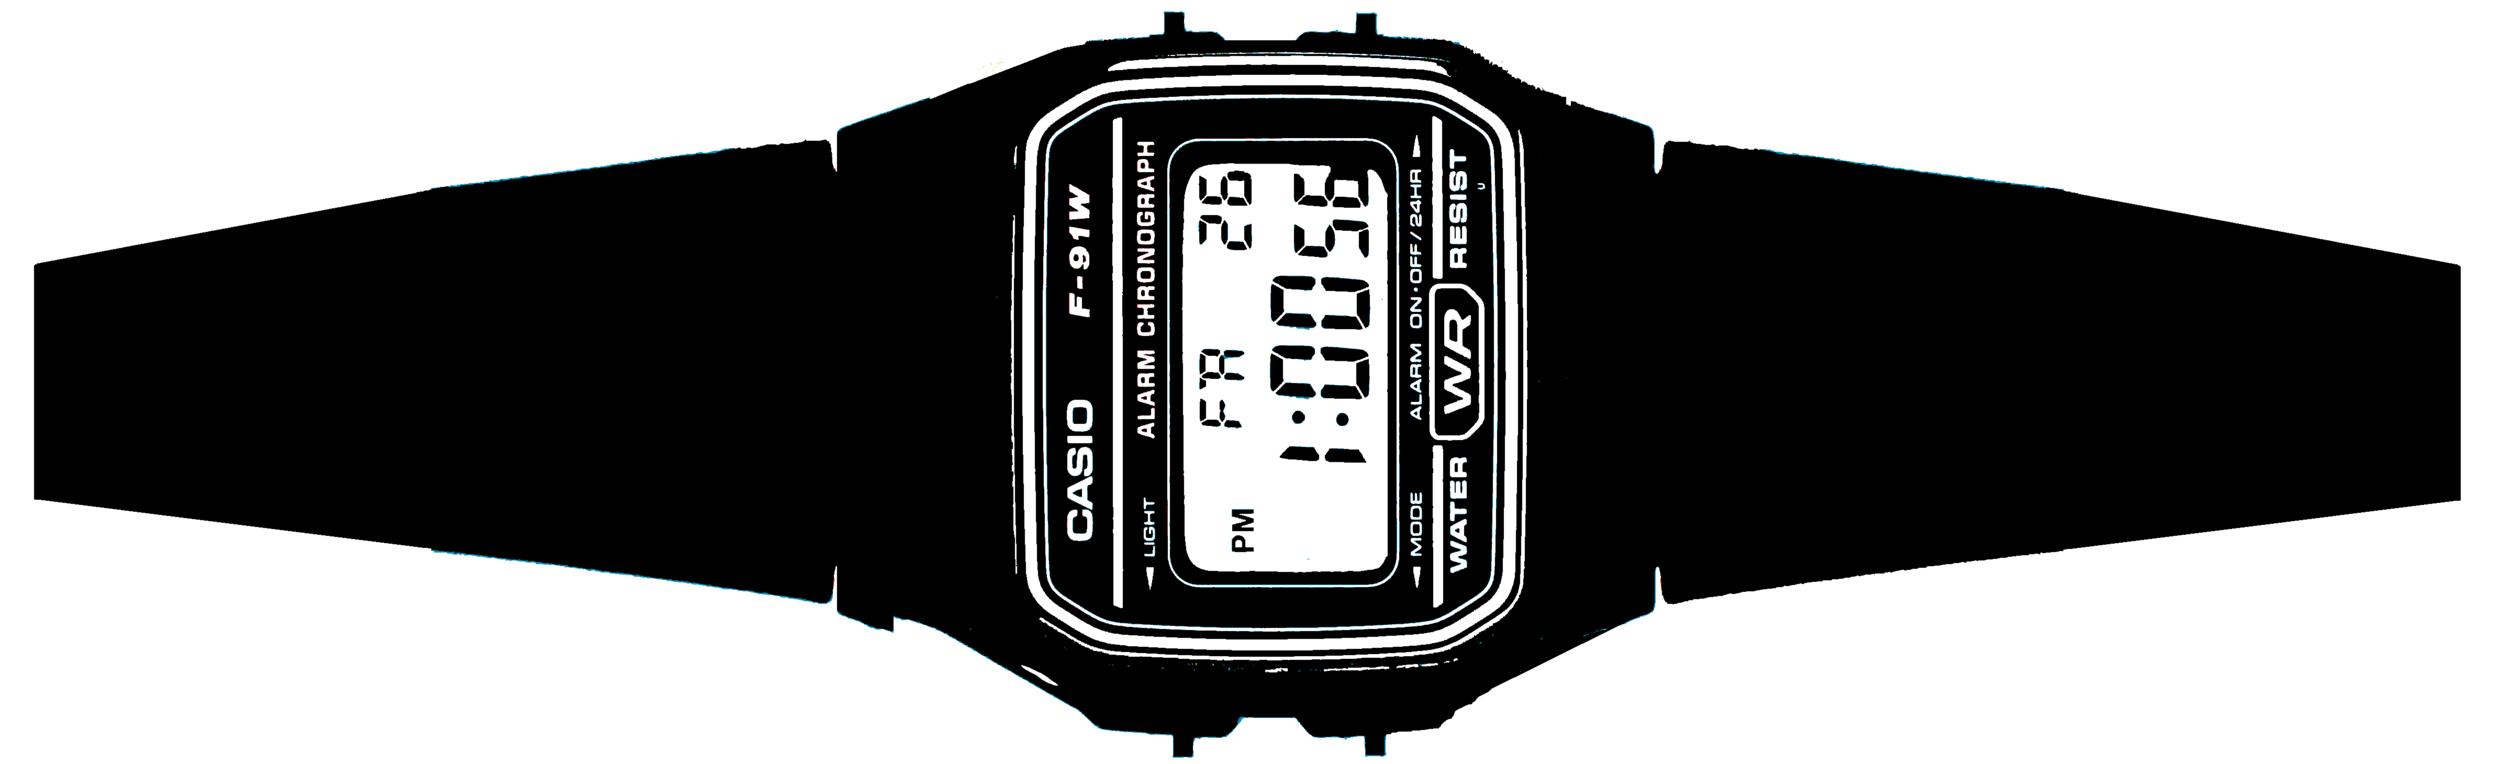 Image Credit:http://ninjas.digital/digits/stop-watch-game/